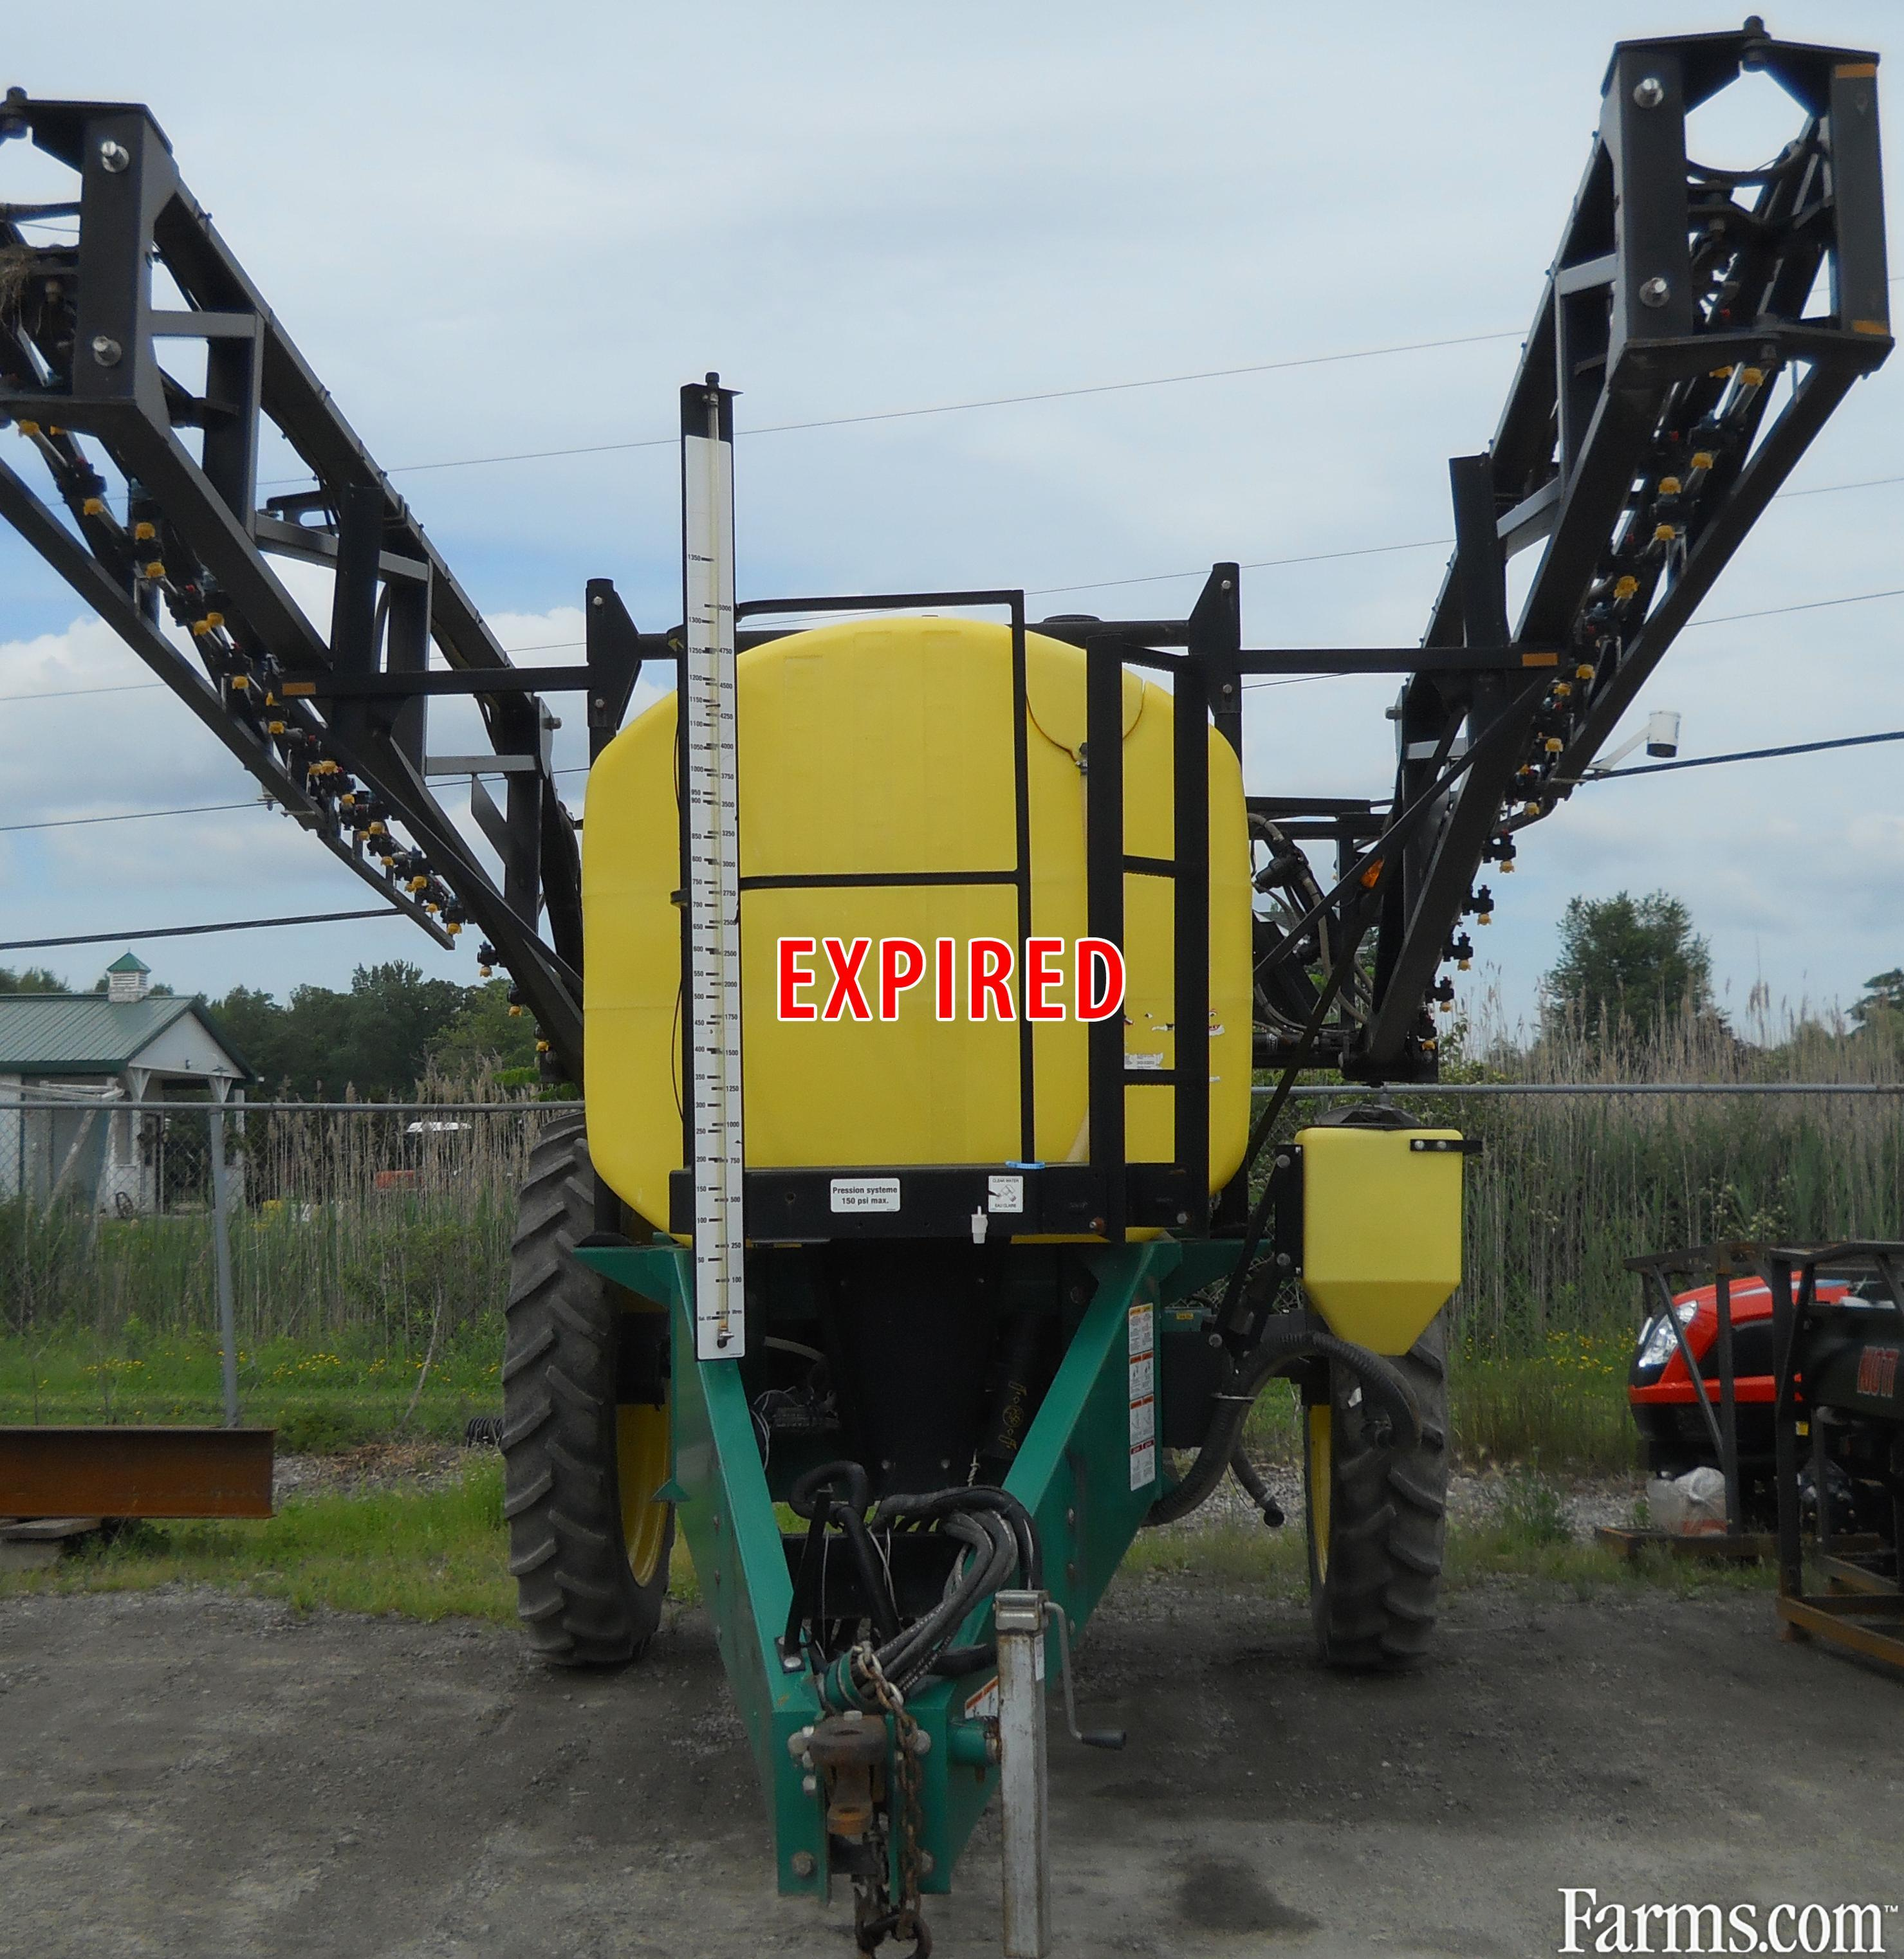 Sold 1250 ms sprayer for sale - Craigslist mississippi farm and garden ...